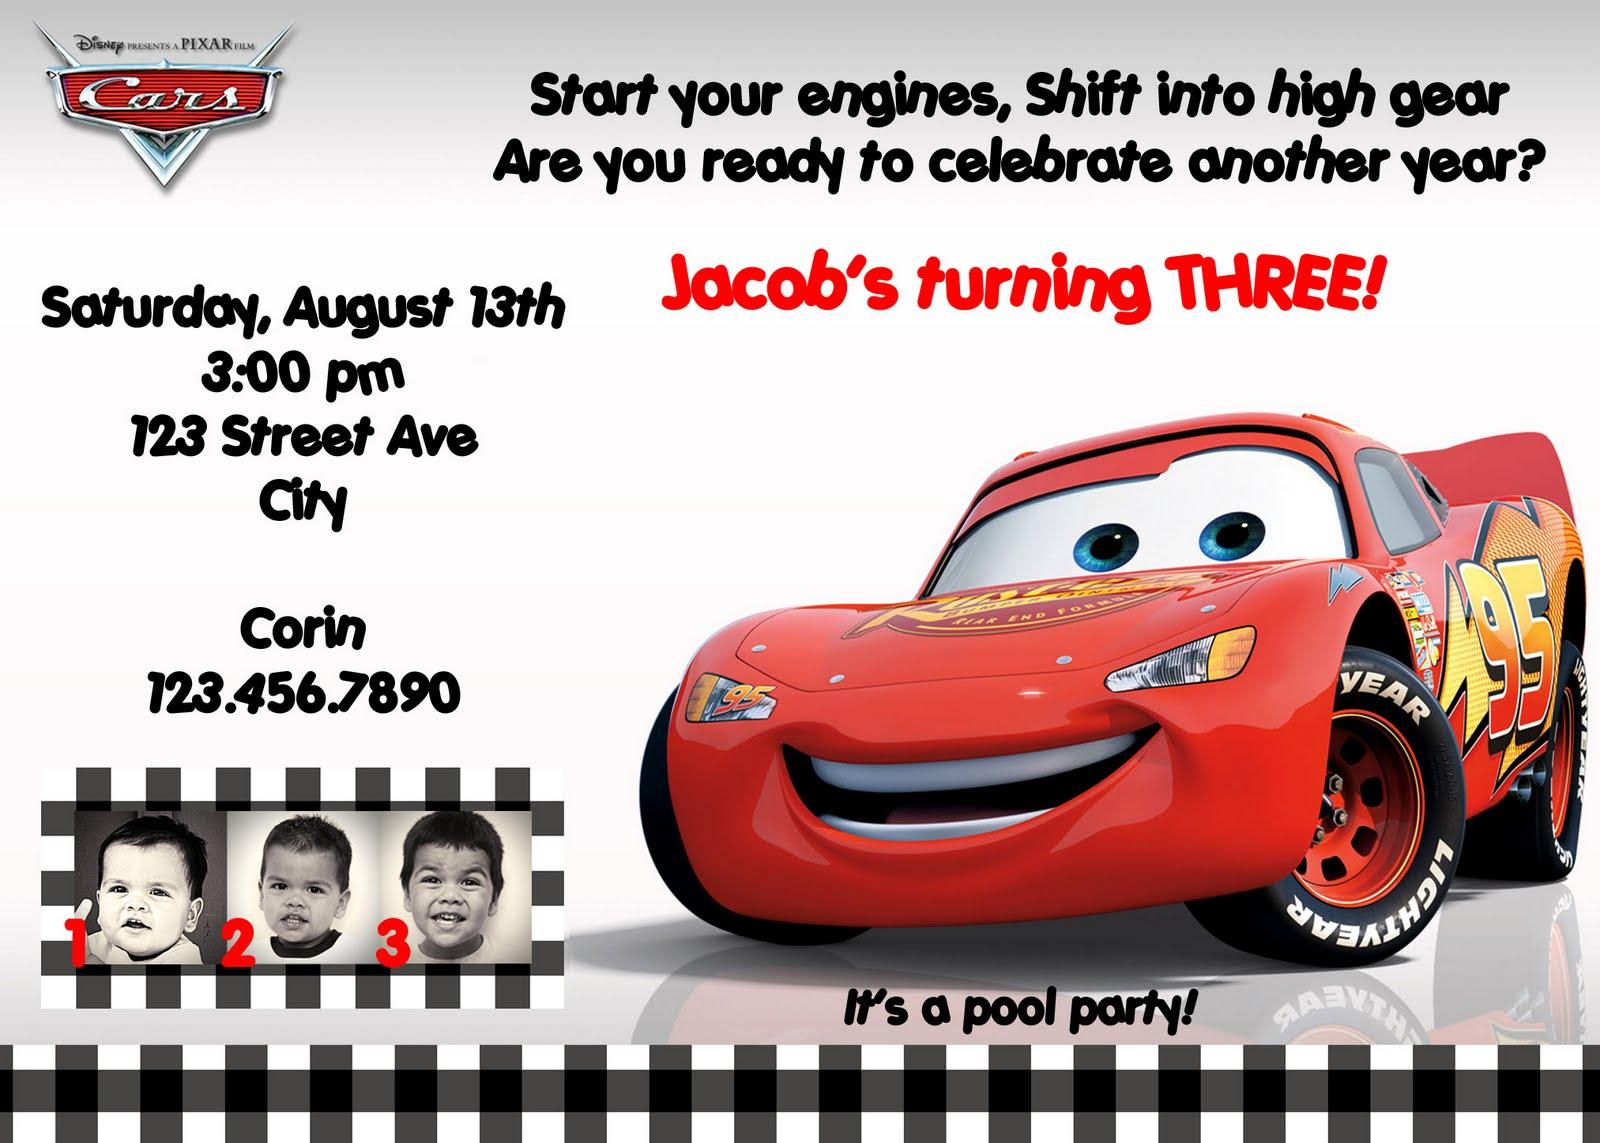 cars+invite 4 disney cars birthday invitations templates on 1st birthday cake ideas cars